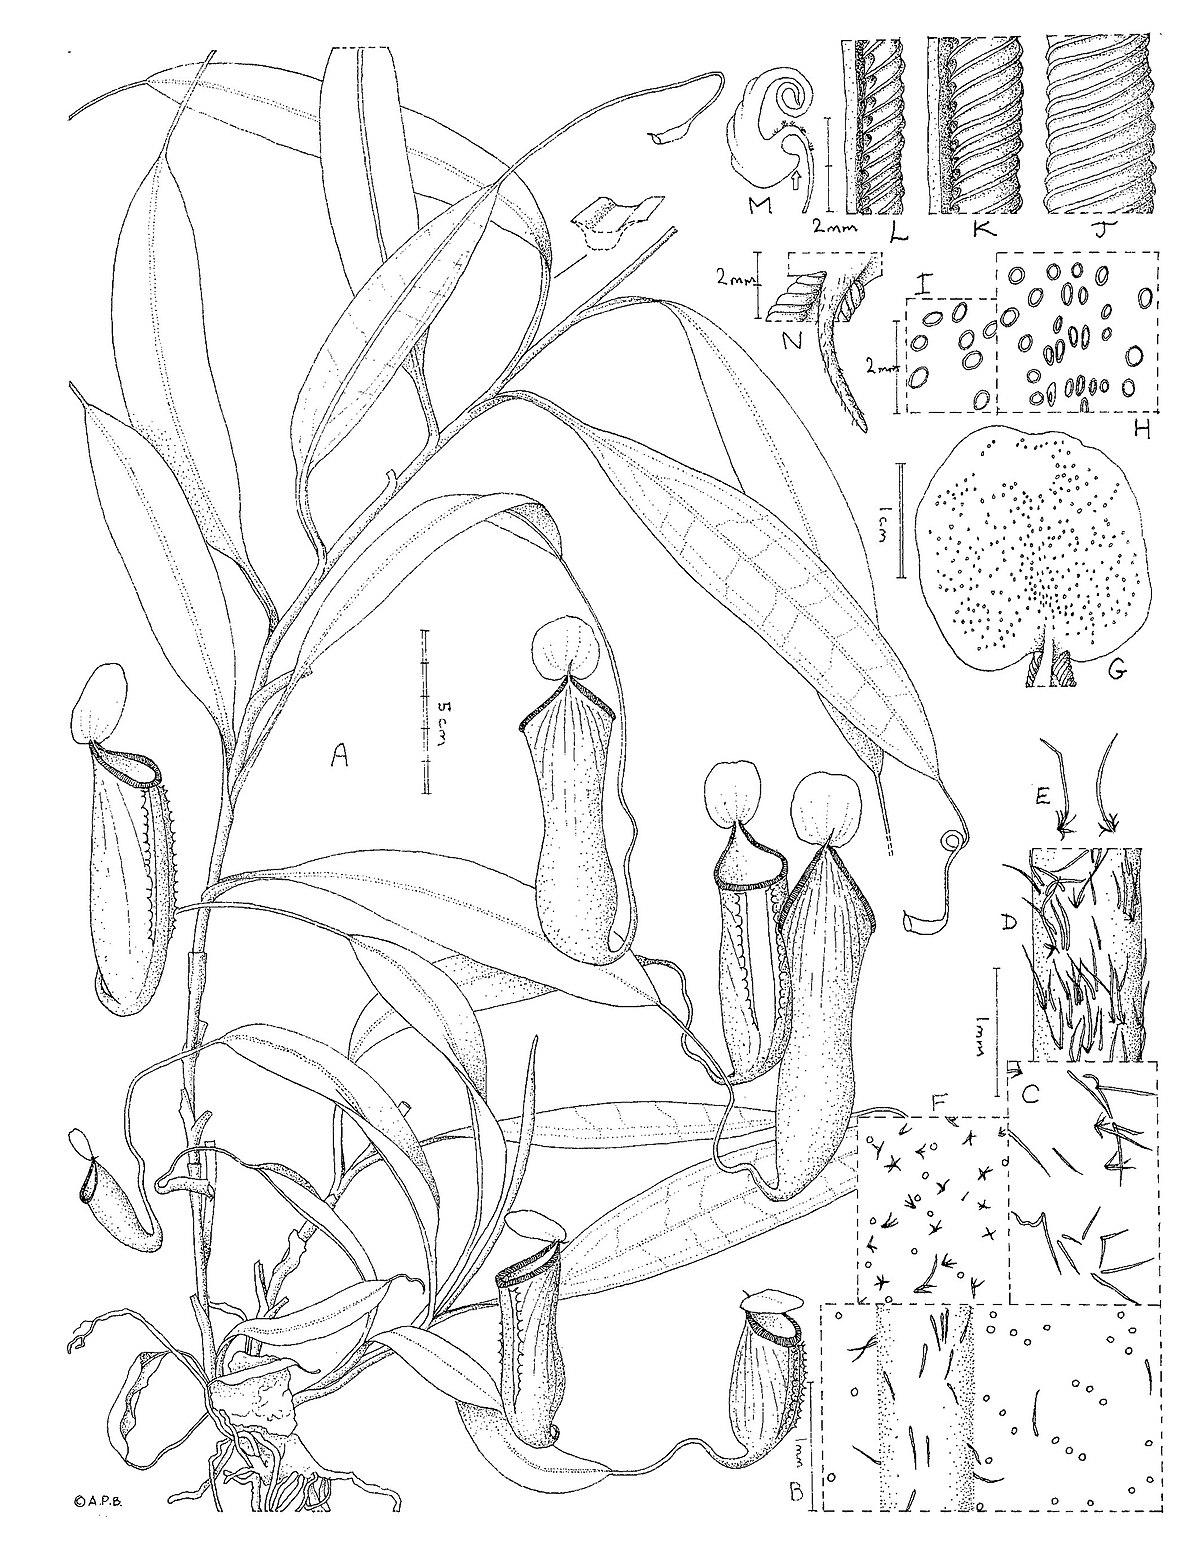 Nepenthes cid - Wikipedia